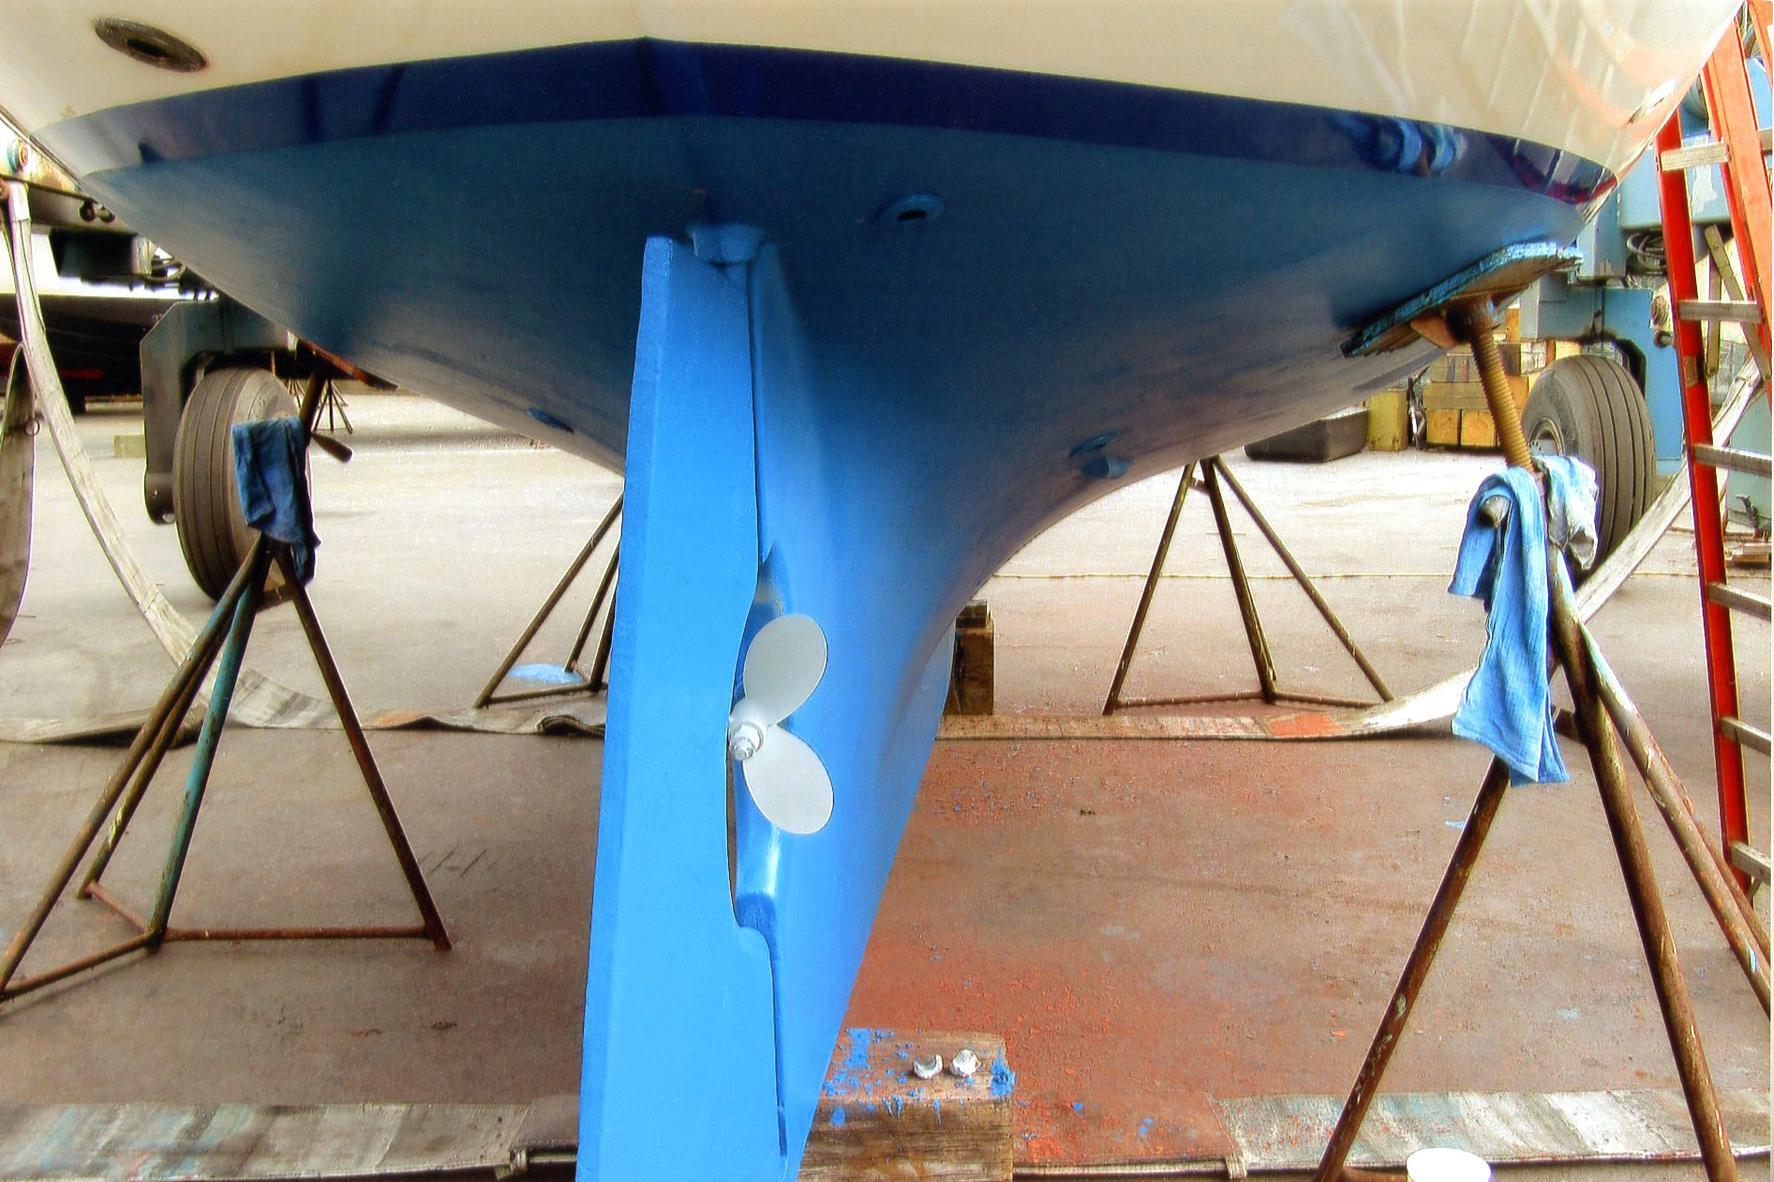 SC 4910 WM Knot 10 Yacht Sales